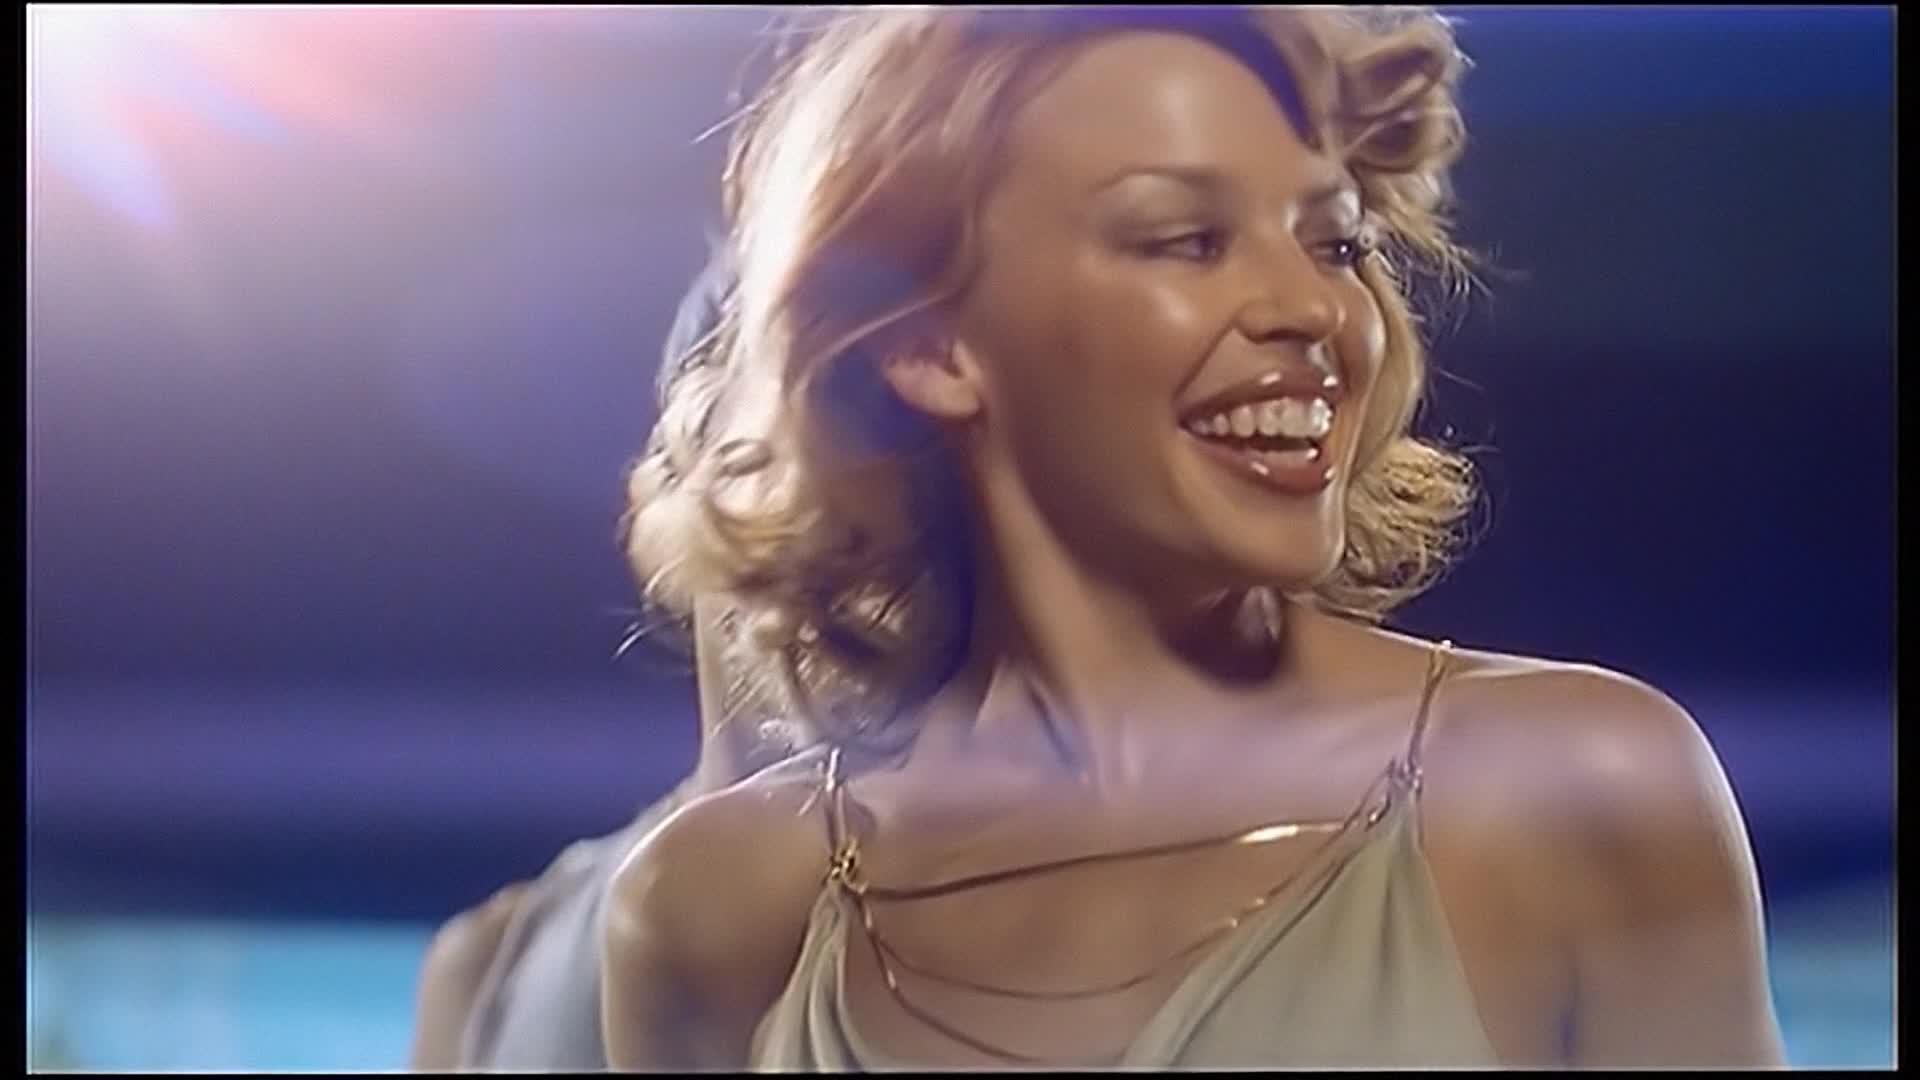 Minogue, Kylie - Spinning Around Pt.2 - Amazon.com Music